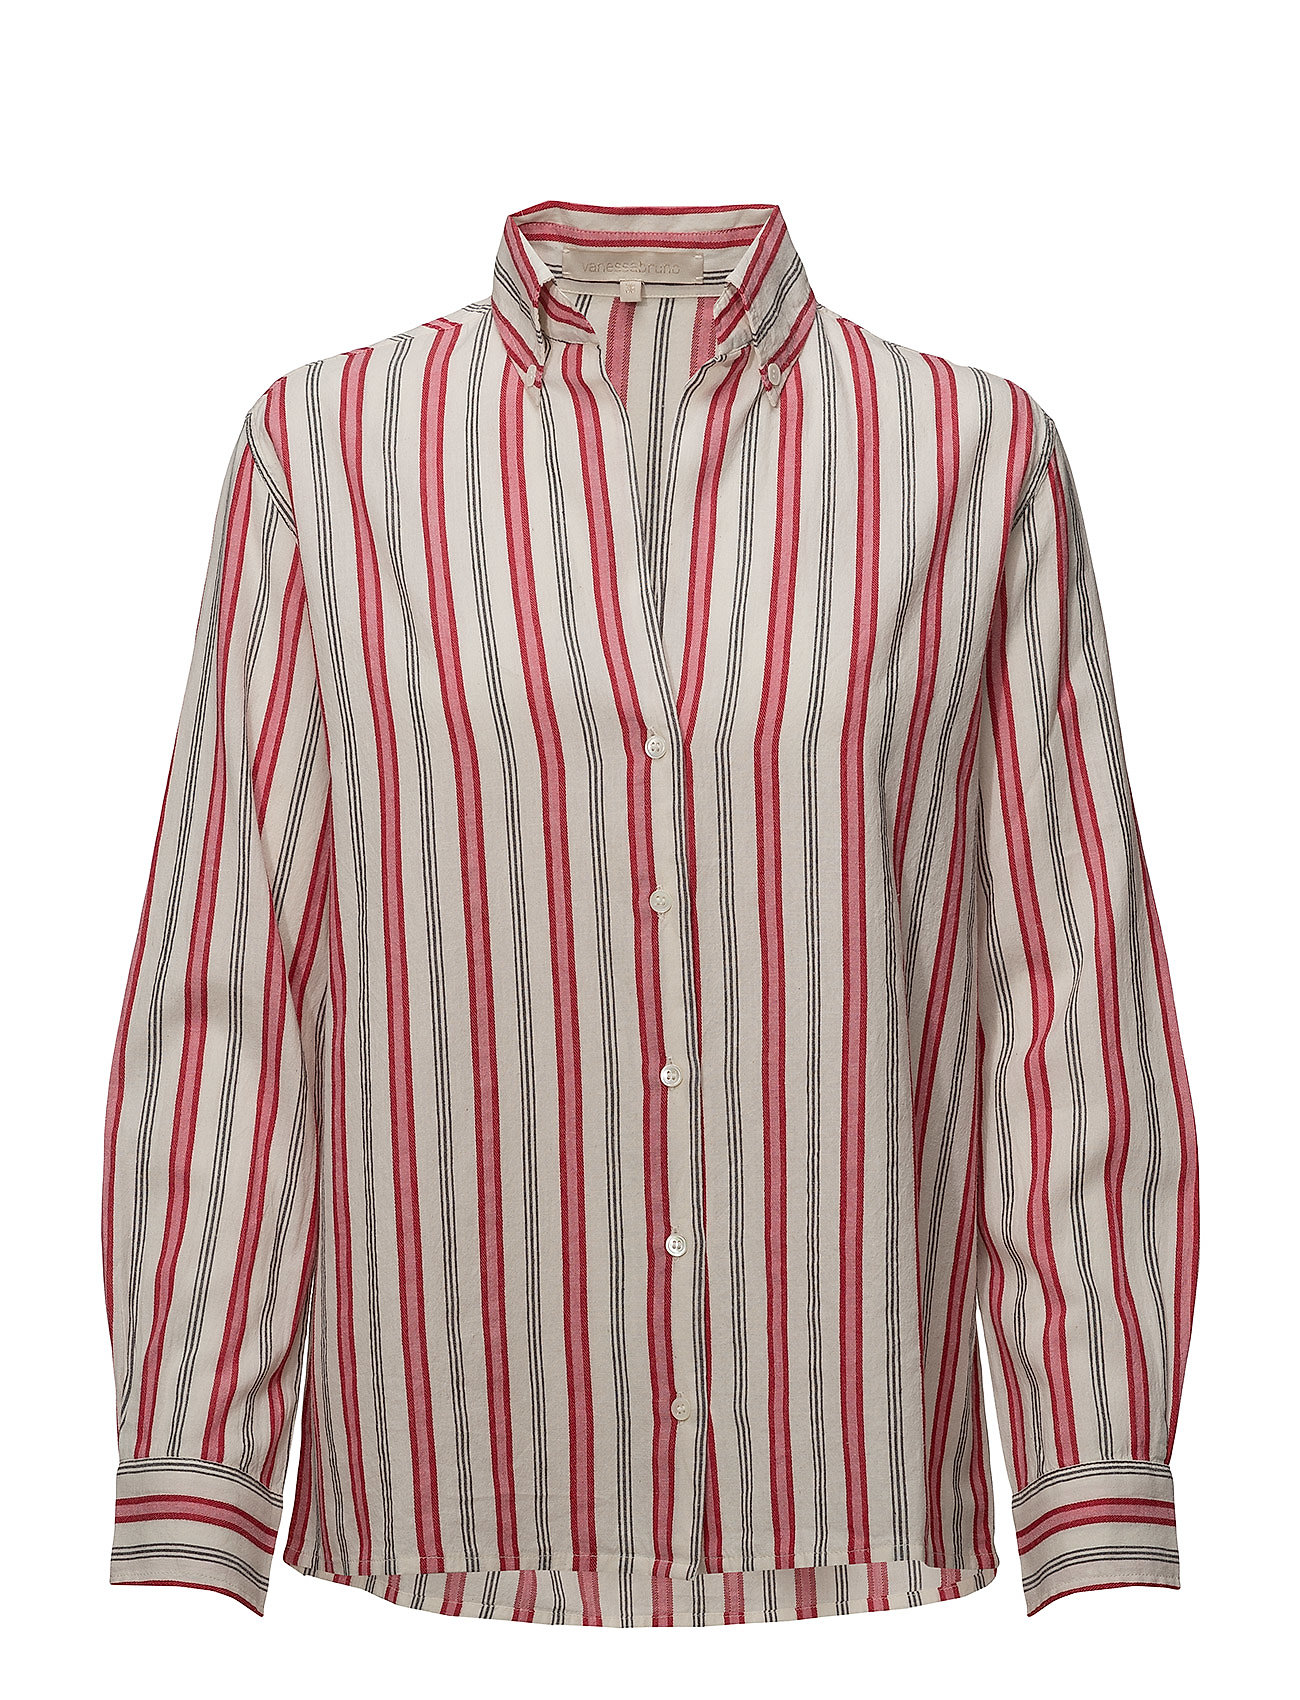 Druyat Sorbet 190 Vanessa Bruno Shirts Blouse